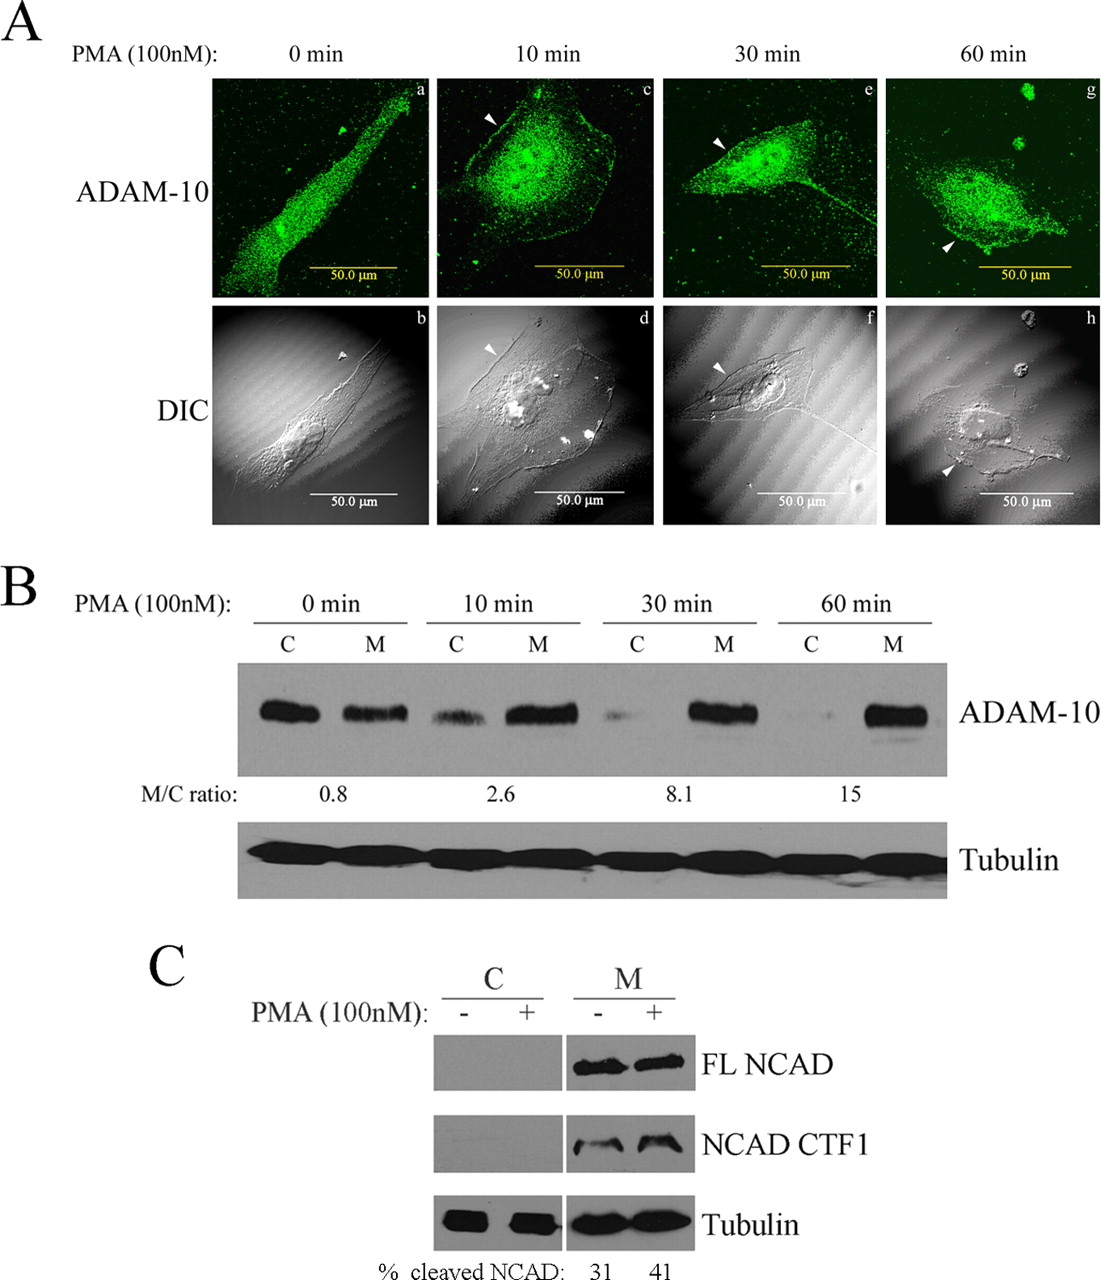 pkc ç mediates glioblastoma cell proliferation through Mapk pathway in glioblastoma cells through pkc of egfr/c-src/pkc-delta induced cell proliferation in progression through the cell cycle as.